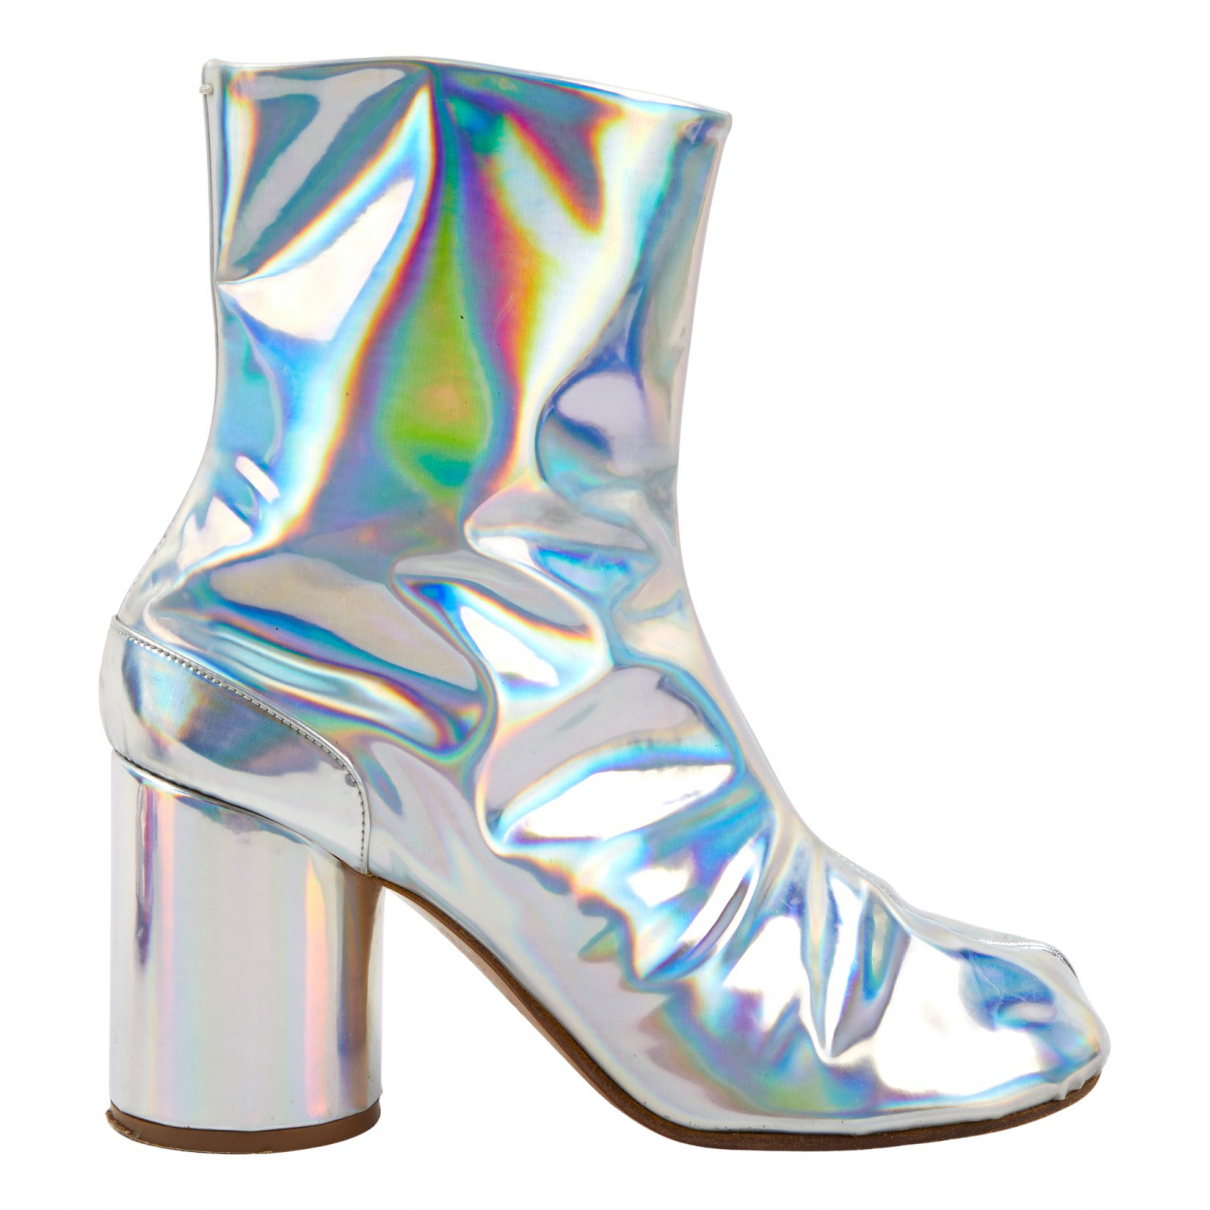 Maison Martin Margiela Tabi Silver Patent leather Ankle boots for Women 40 EU